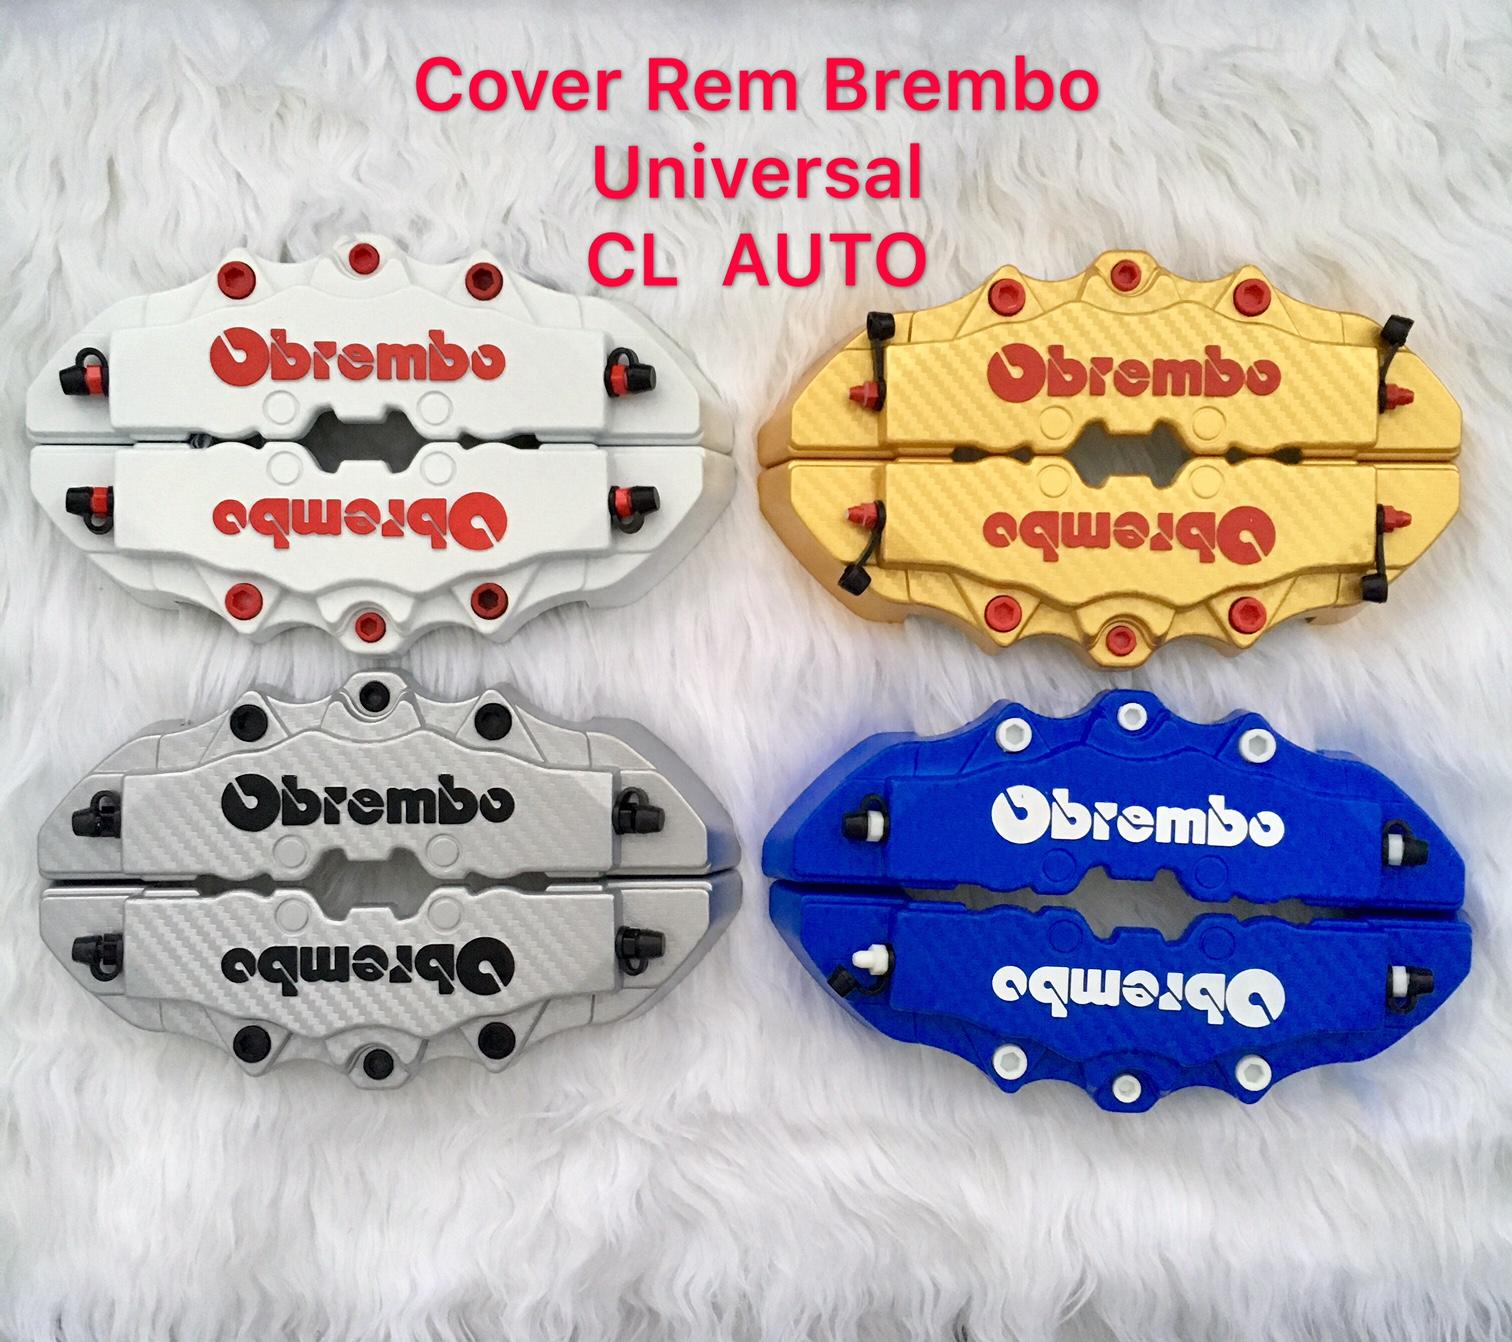 ... Jual OTOmobil Brake Disc Cover Brembo Chrome Emboss Timbul Pelindung Source Cover Rem brembo Cover